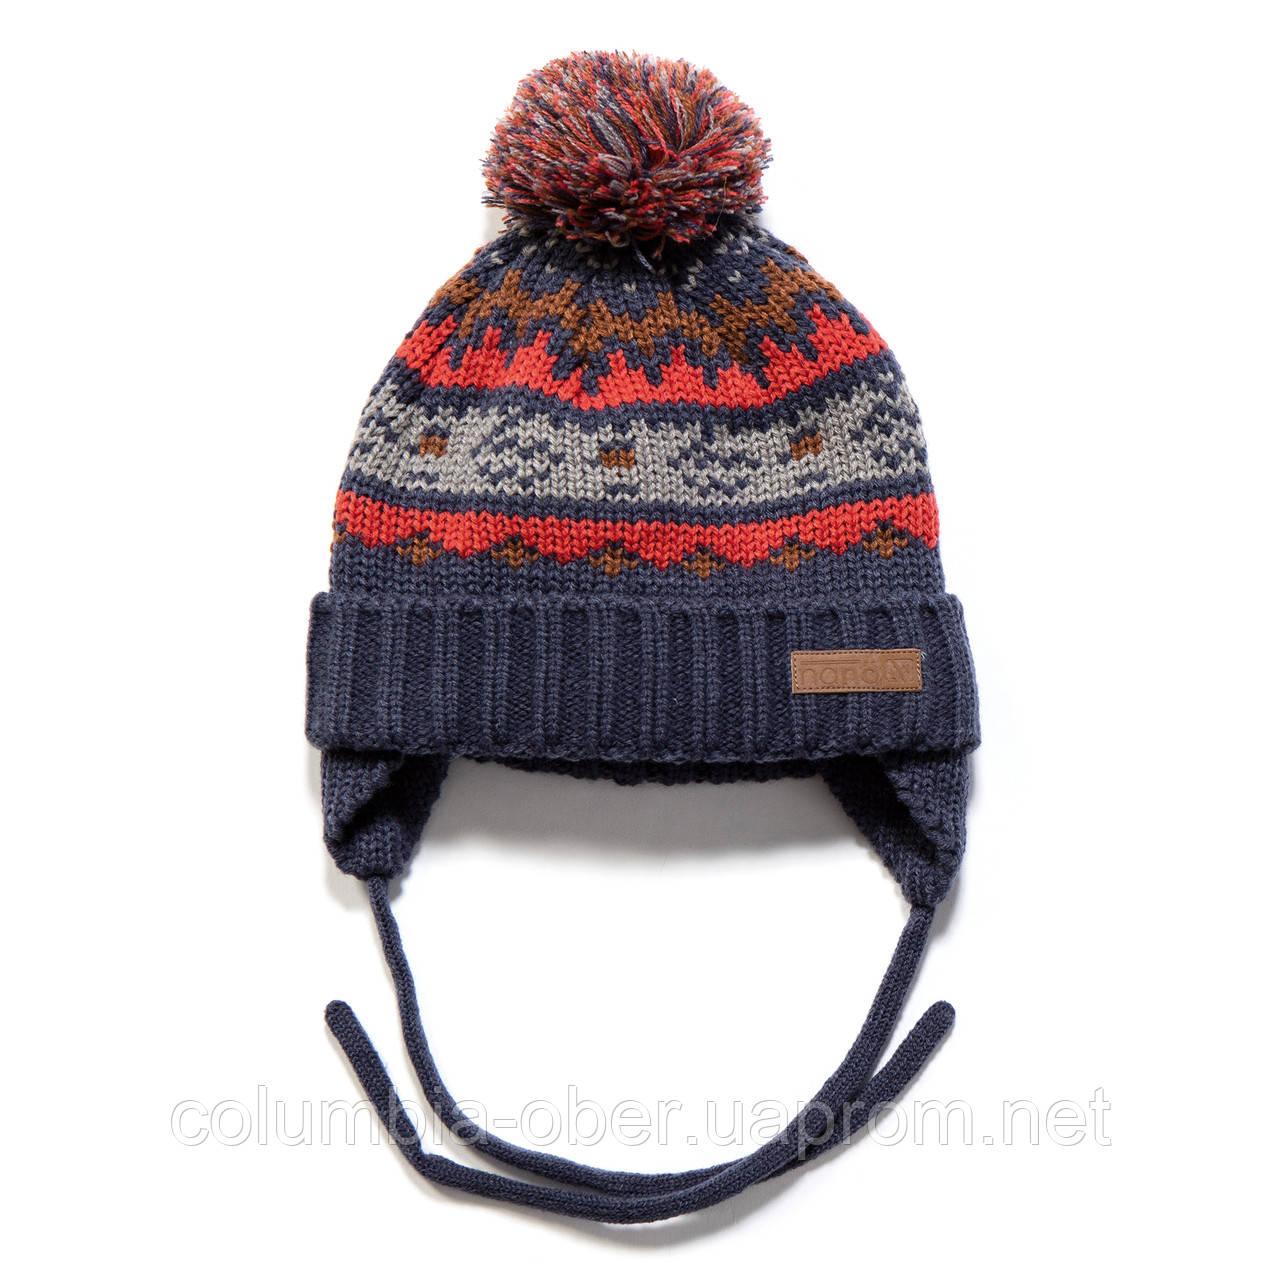 Зимняя шапка для мальчика Nano F17 TU 267Crown Blue . Размеры 9/12 мес -  7/12.